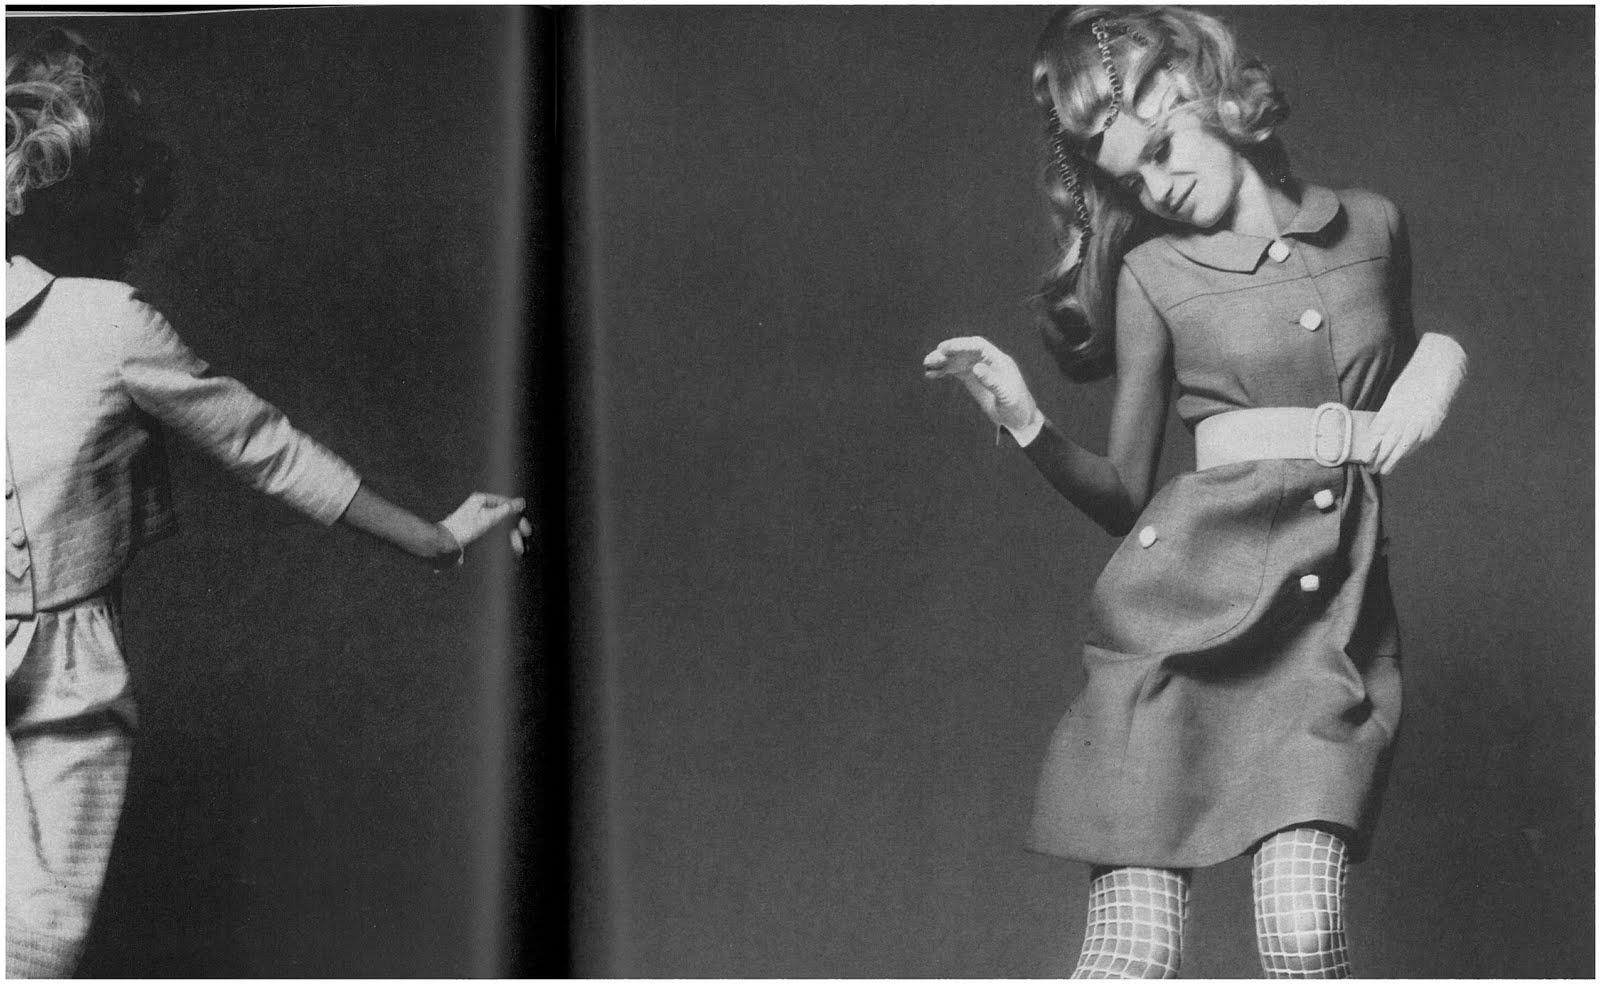 march 1967 us vogue veruschkaavedon the fashion spot